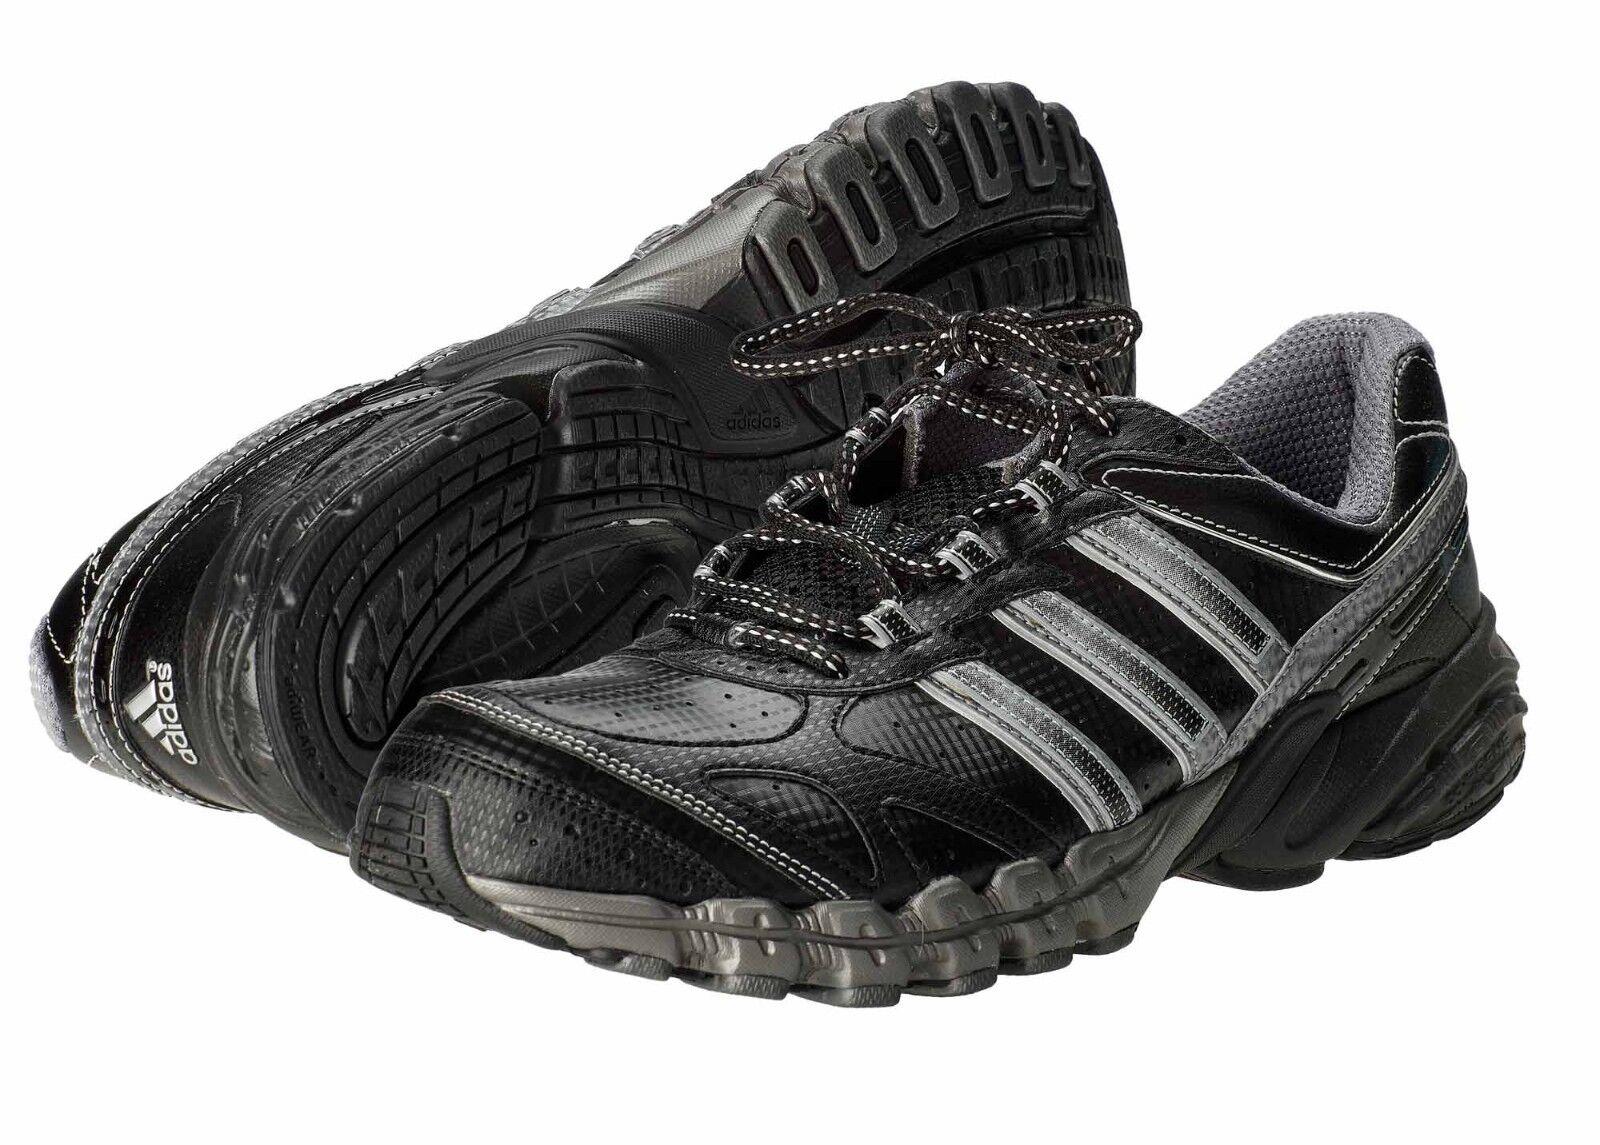 Adidas Laufschuhe Kooger Synth, black silver, 929479 - Running